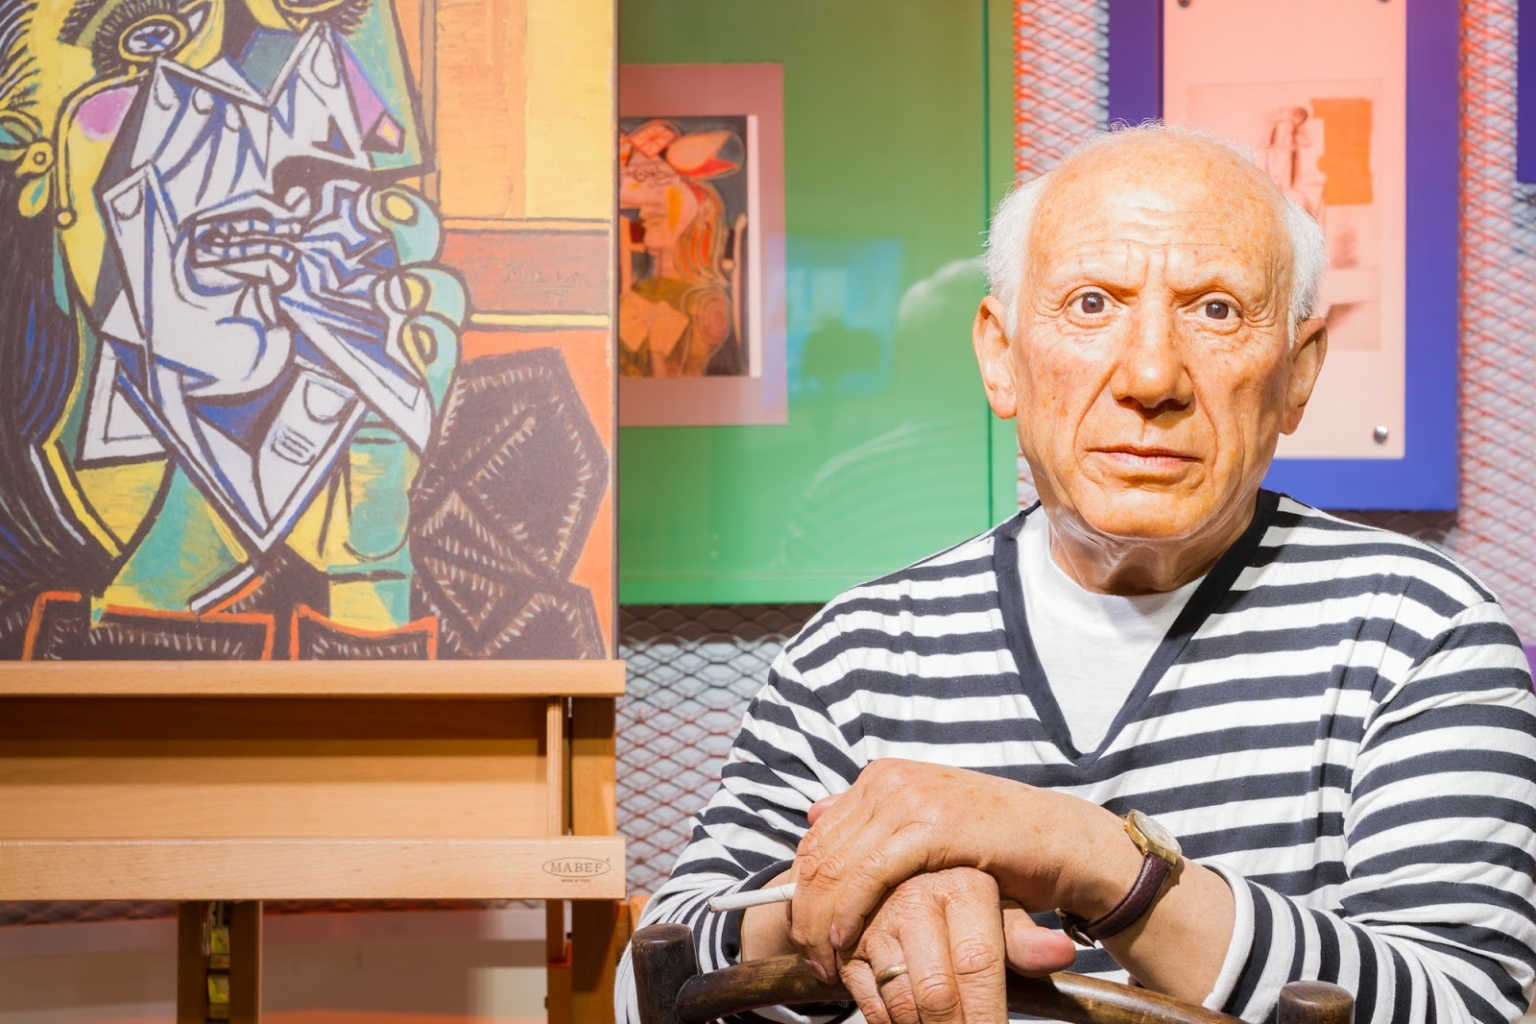 Híres festők furcsa szokásai - Pablo Picasso